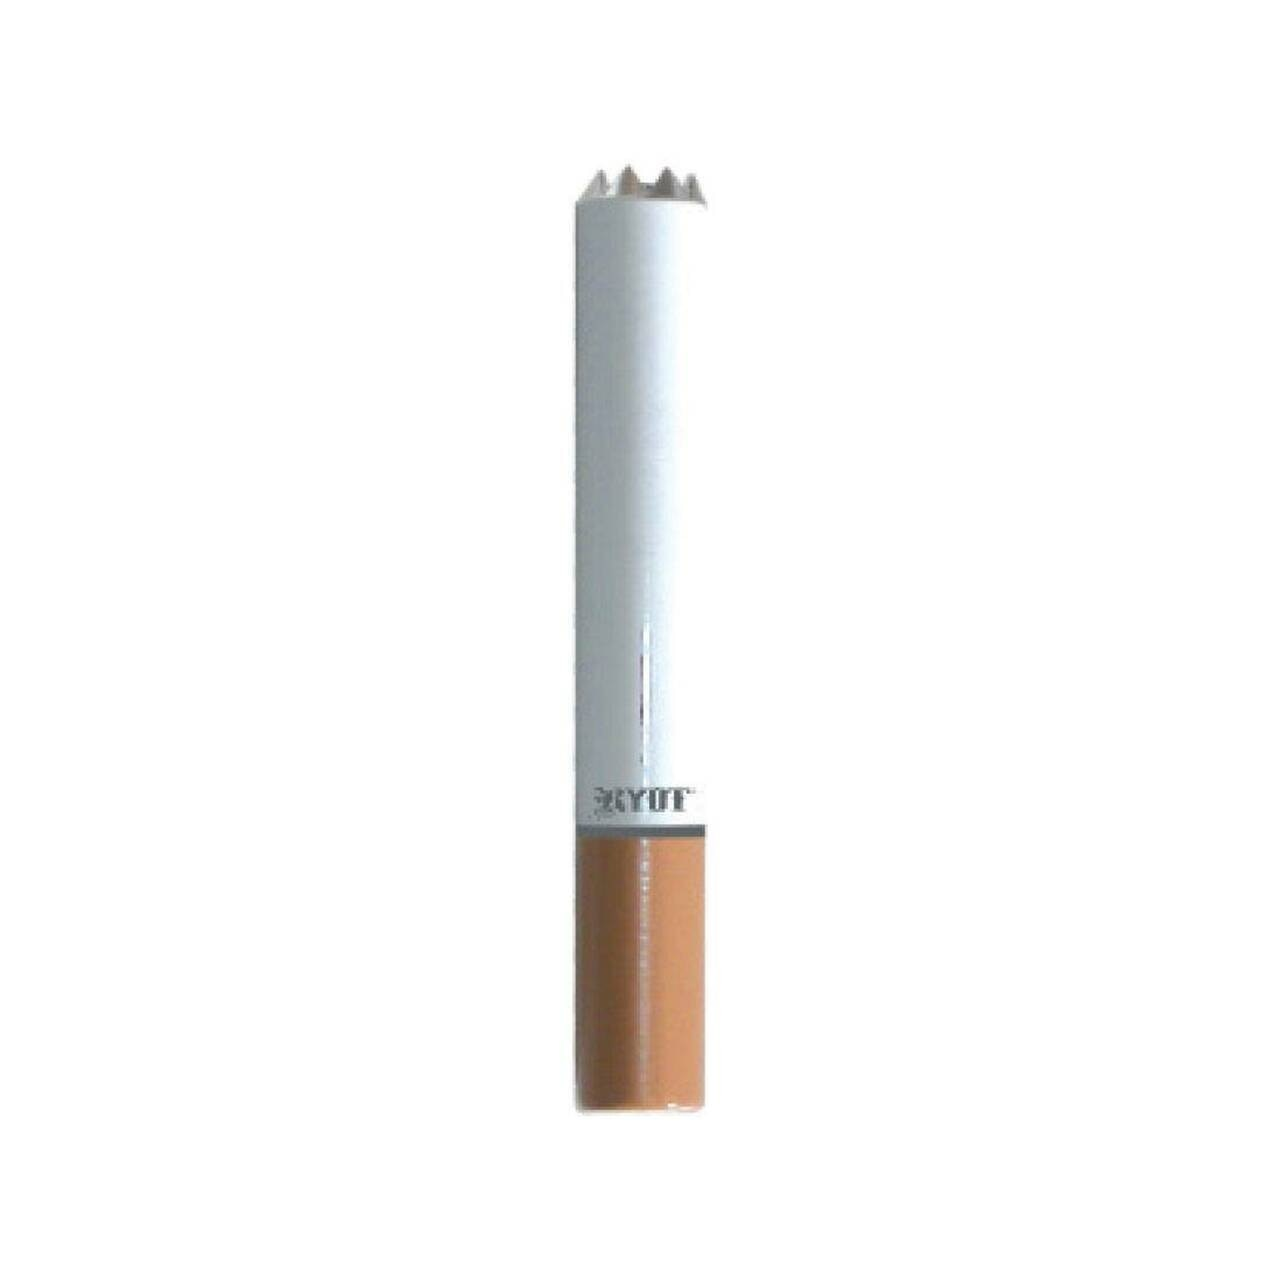 "Ryot Ryot Cigarette Bat 2"" One Hitter"